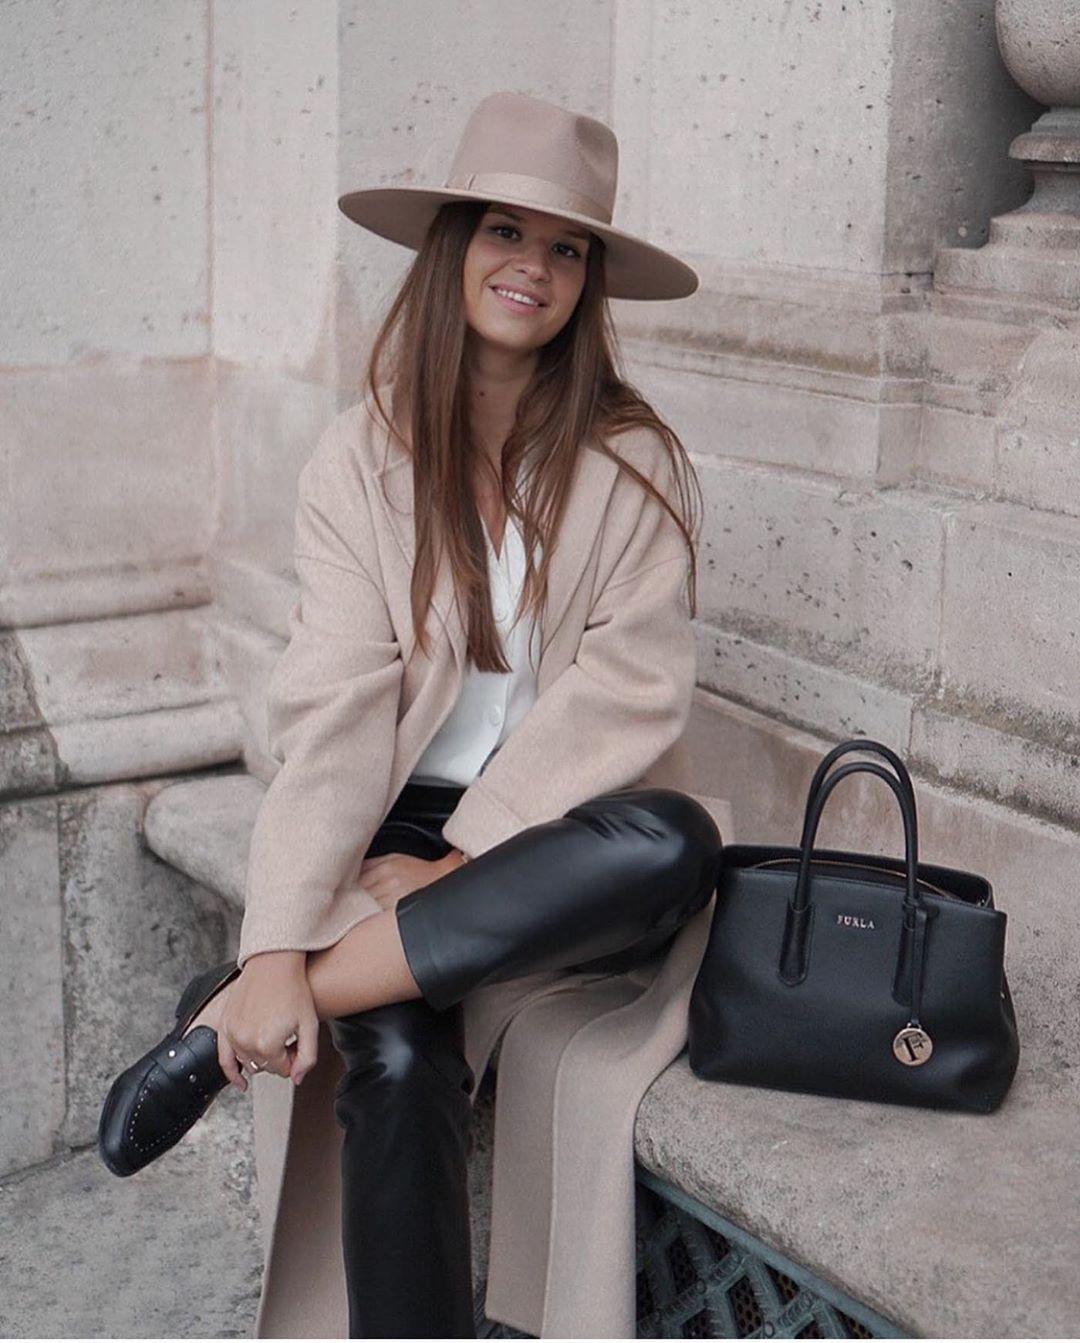 manteau à col enveloppant de Zara sur zara.outfits